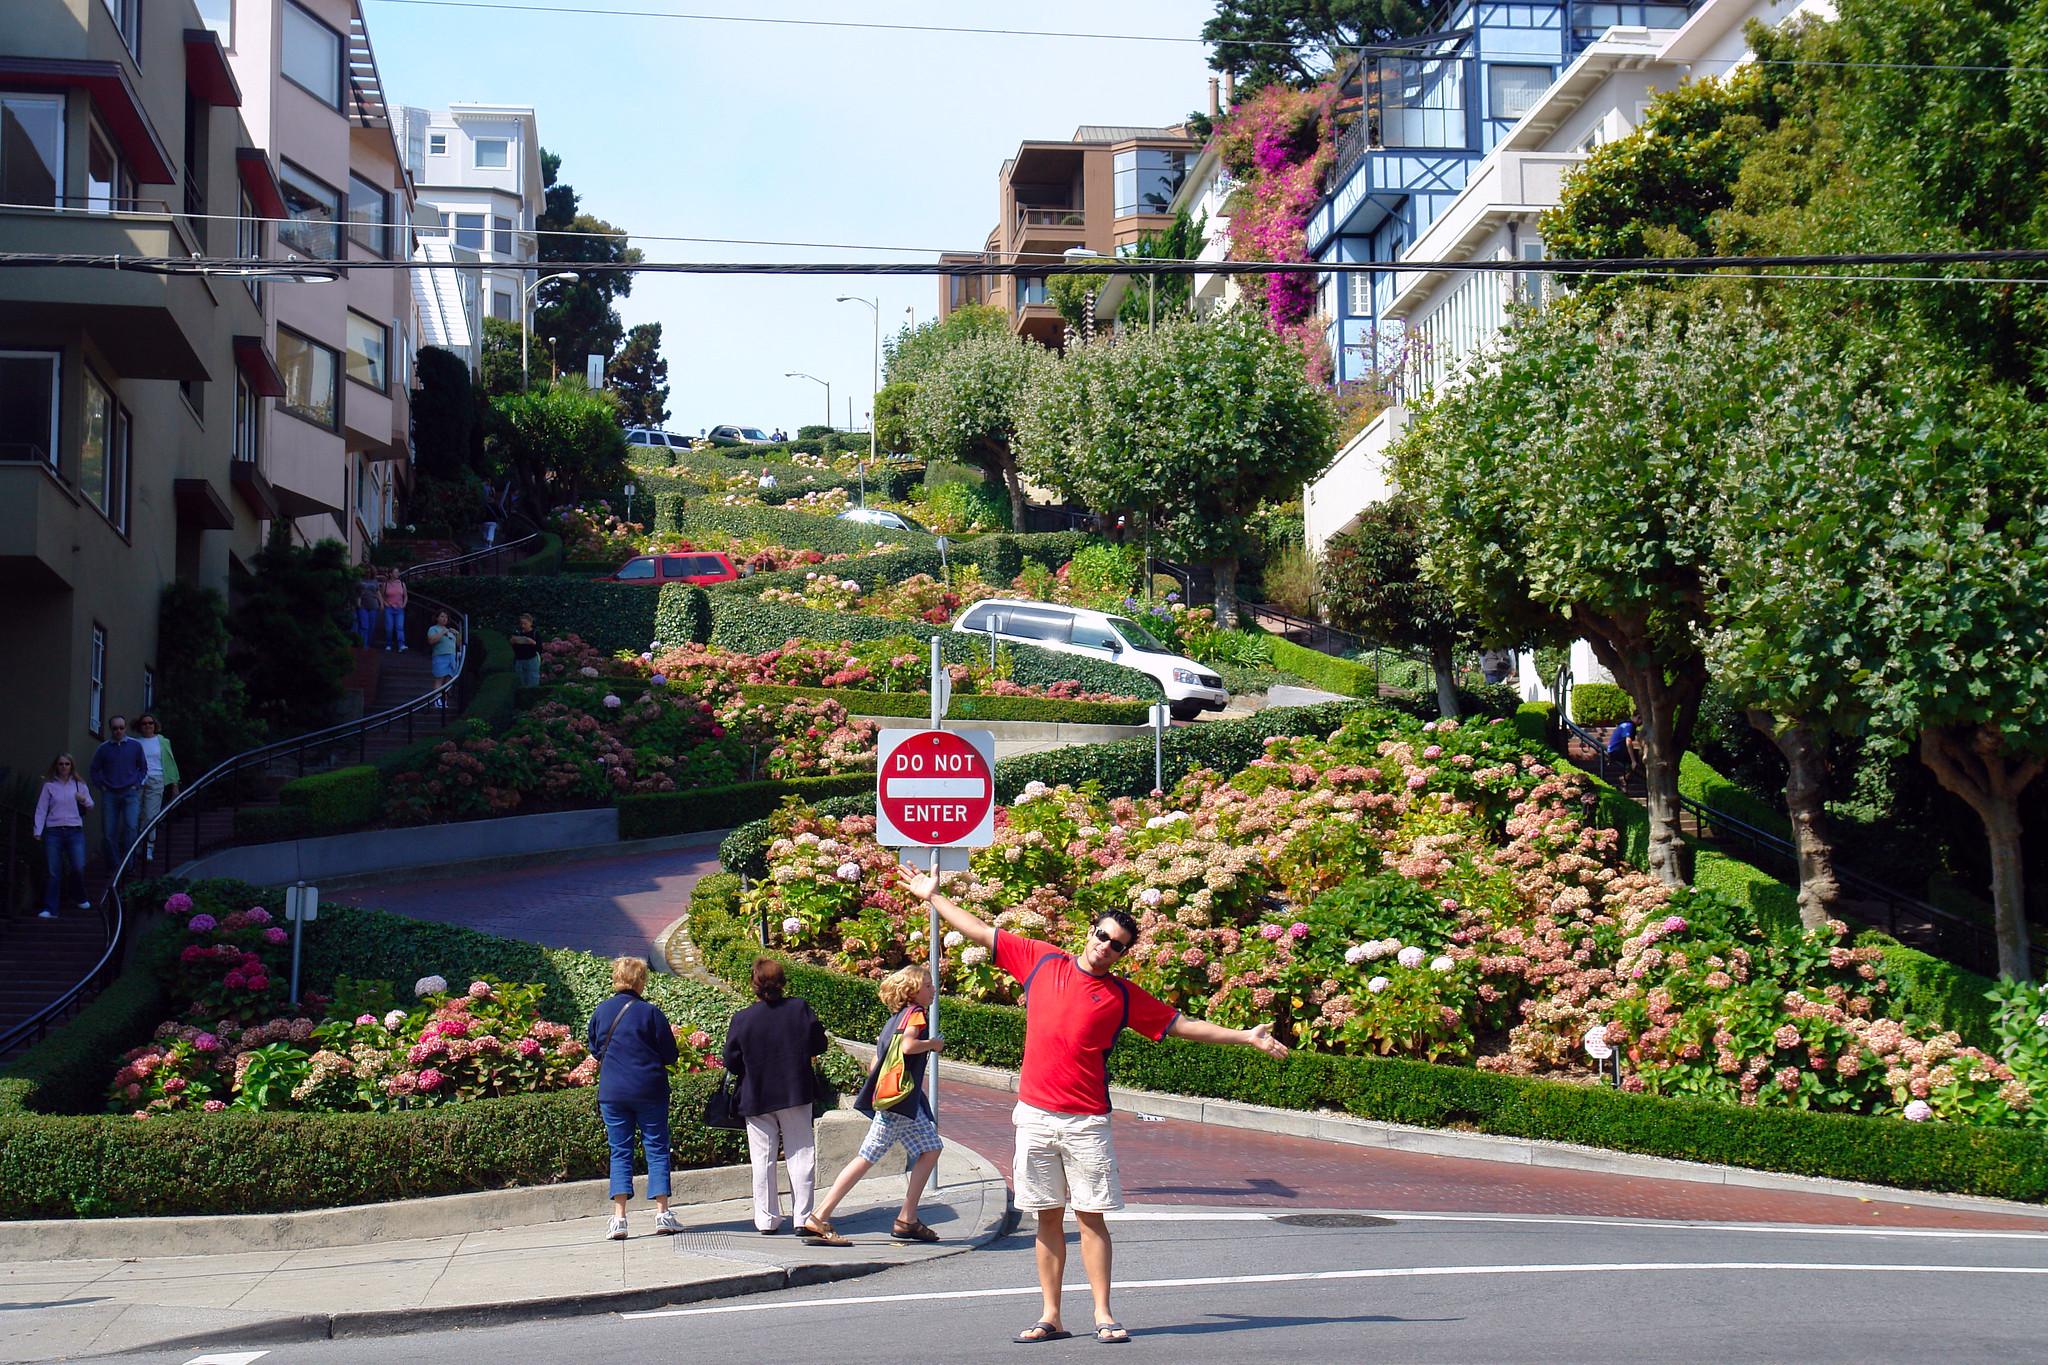 Que ver en San Francisco, California que ver en san francisco - 26012534787 821c64716b k - 10 lugares mágicos que ver en San Francisco, California